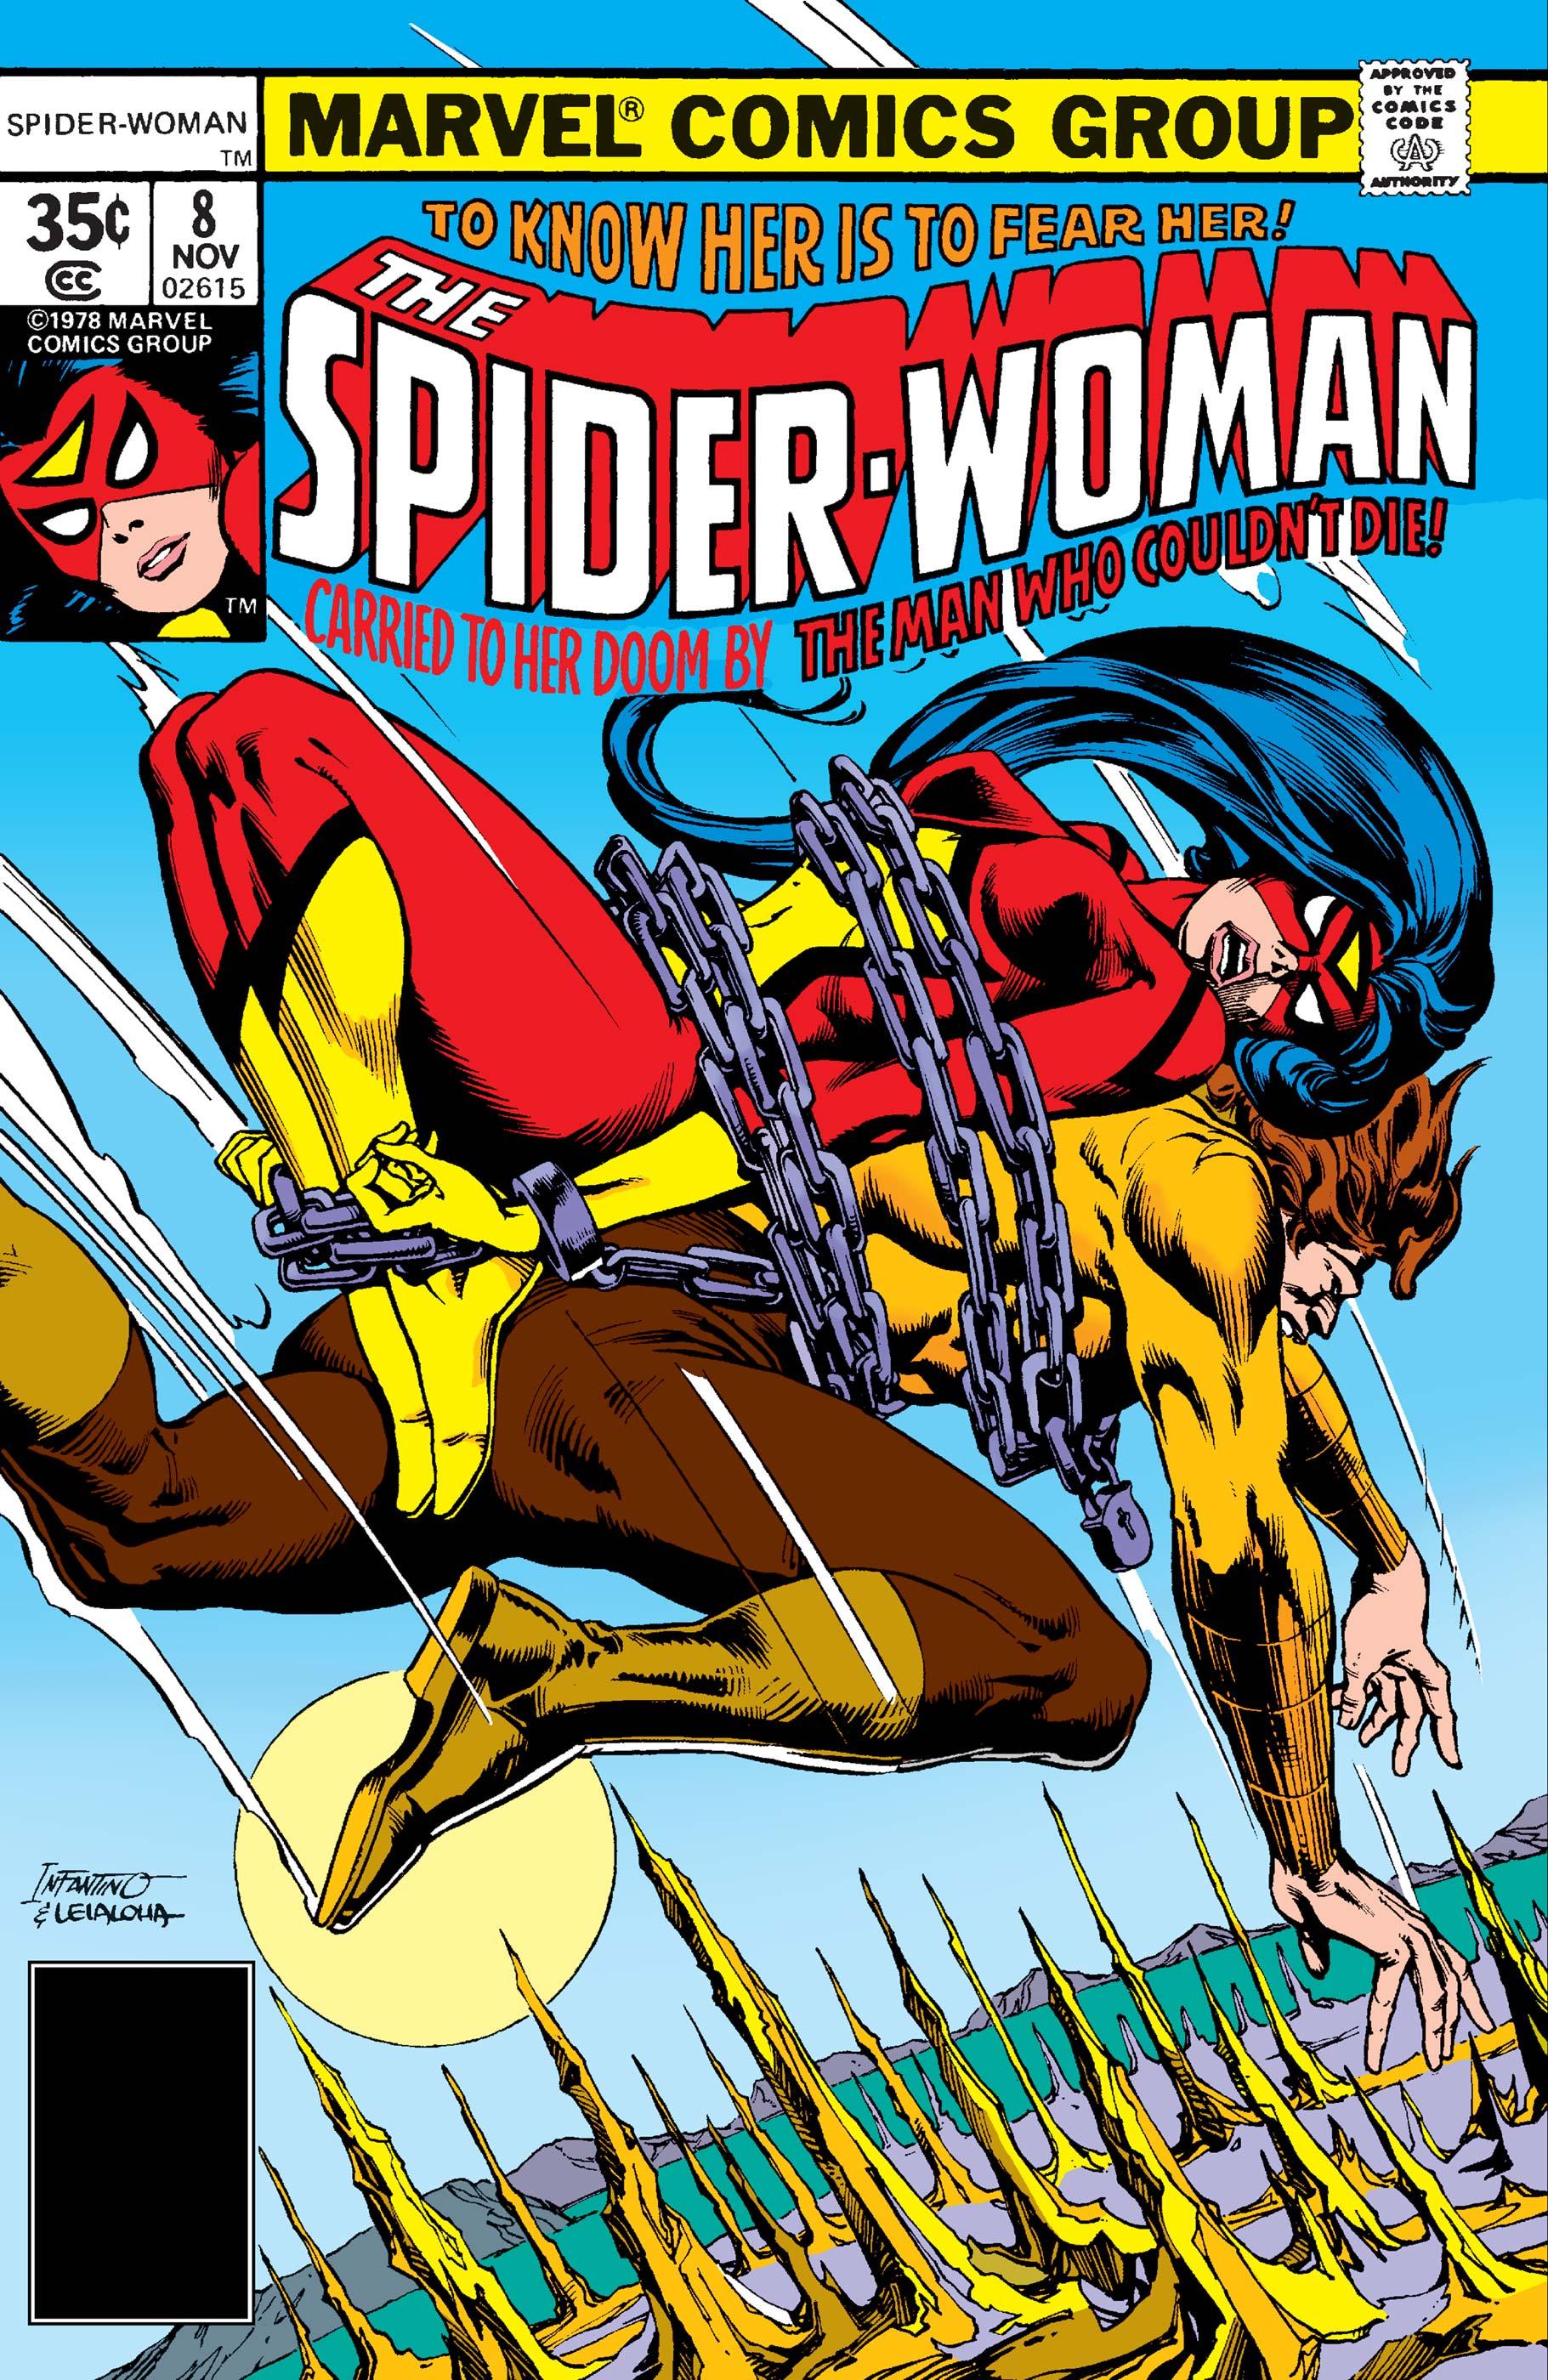 Spider-Woman (1978) #8